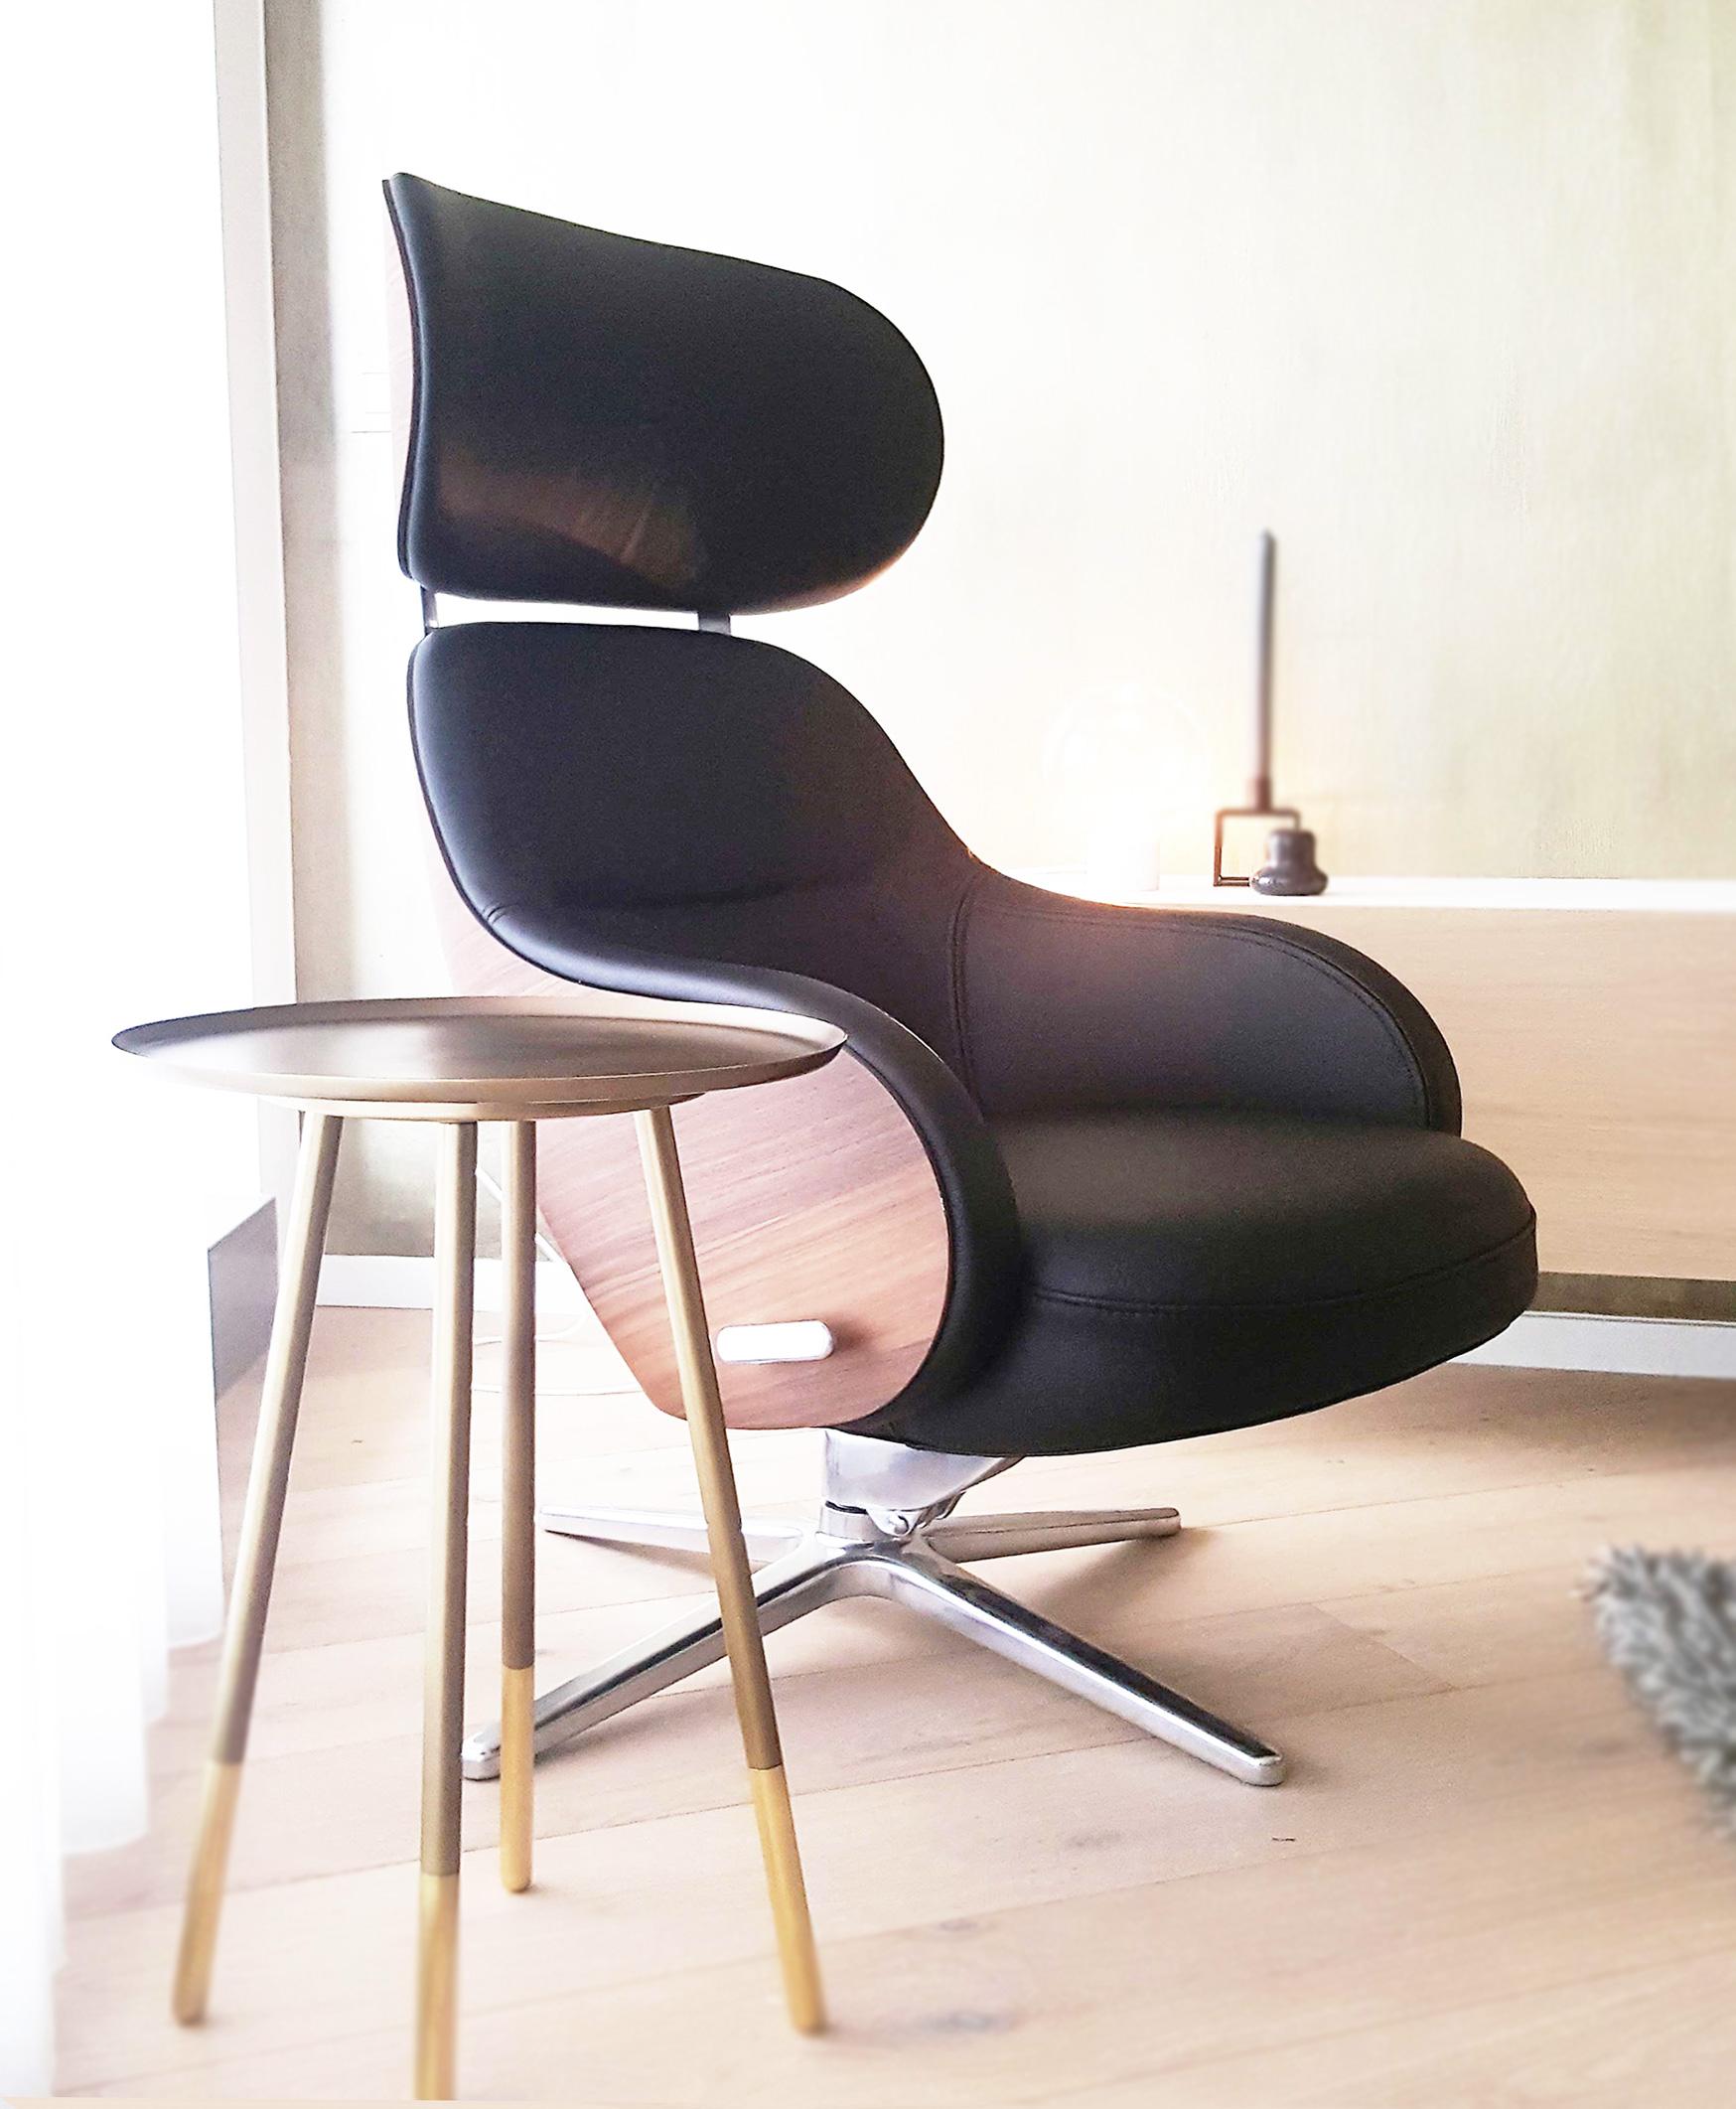 Mooie Design Fauteuils.Fauteuils Van Evolution Topaanbod Design Fauteuils